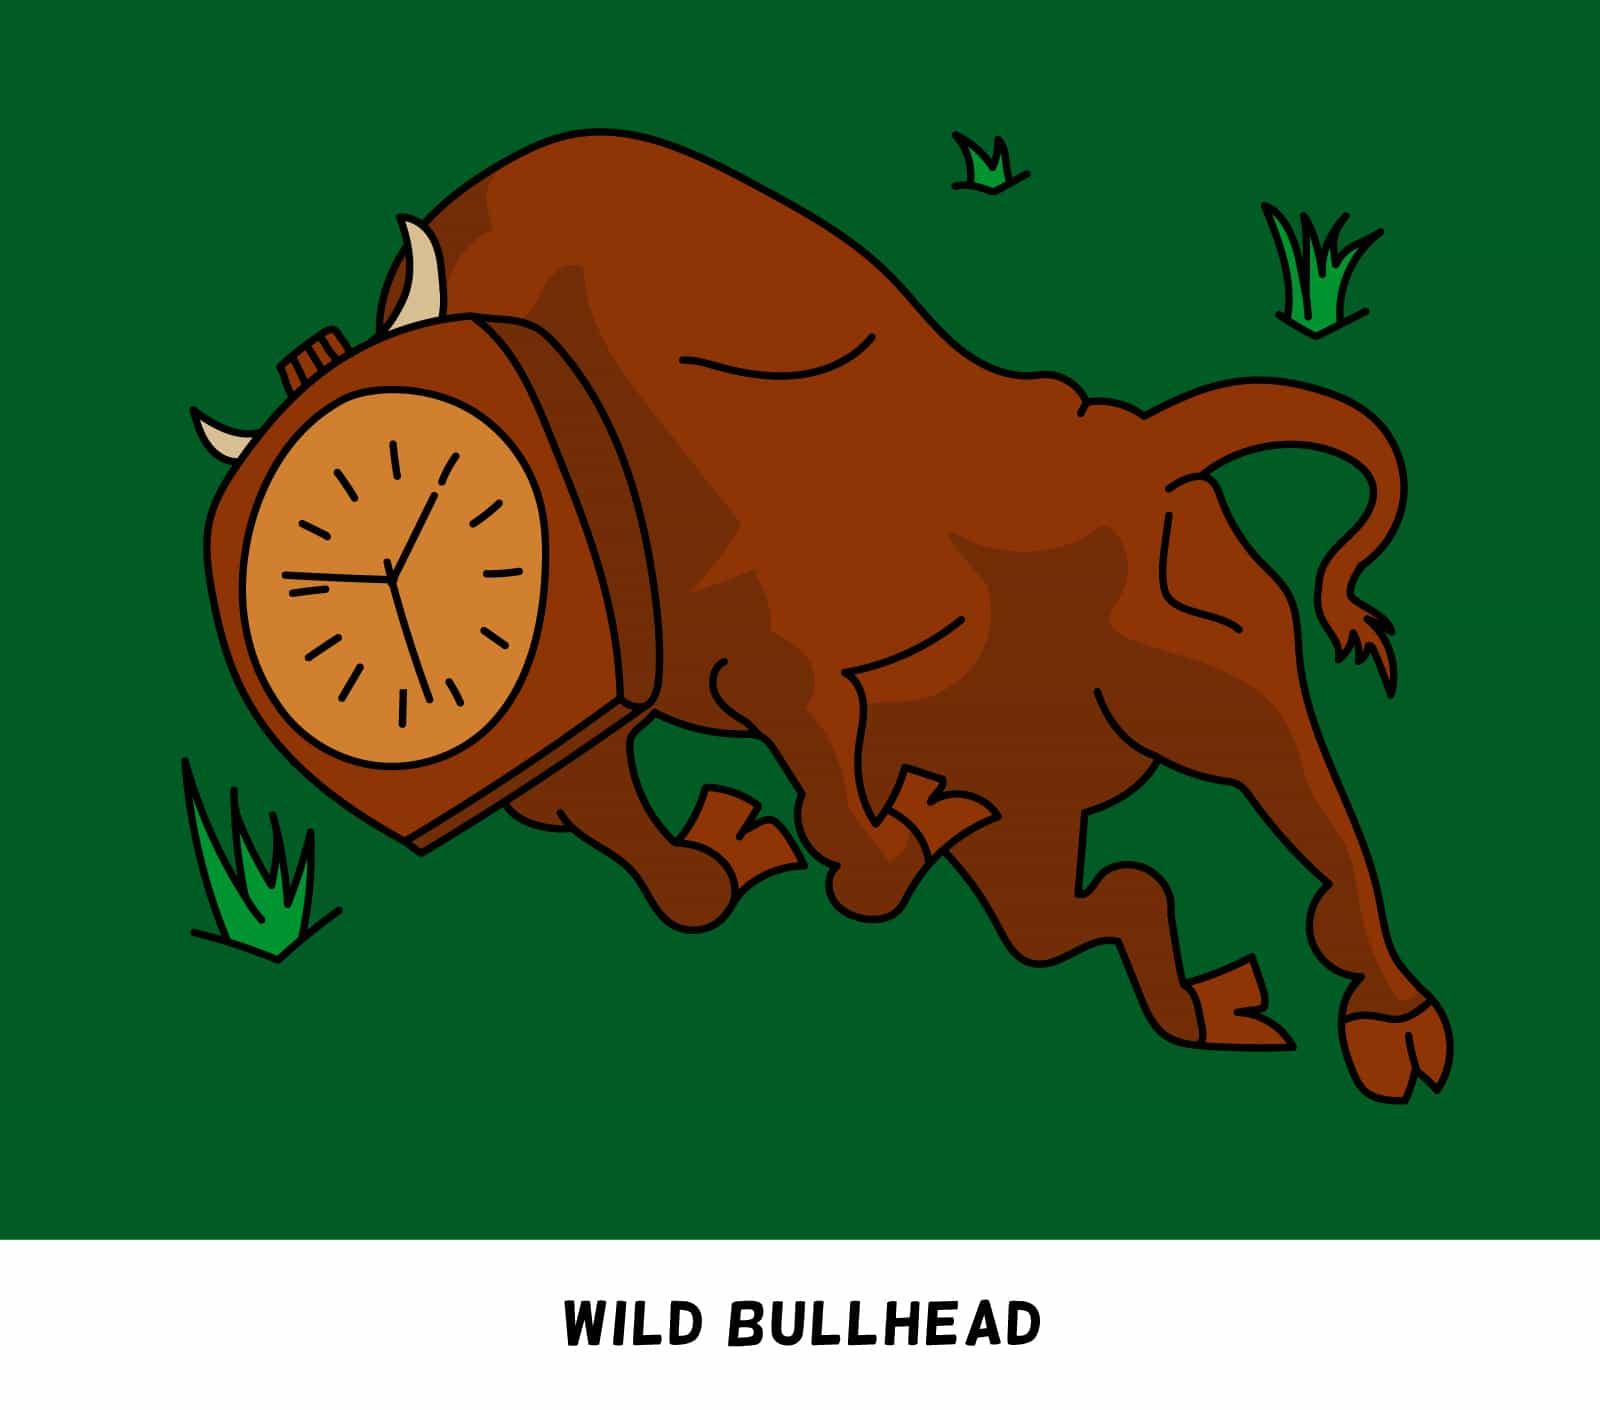 Wild Bullhead